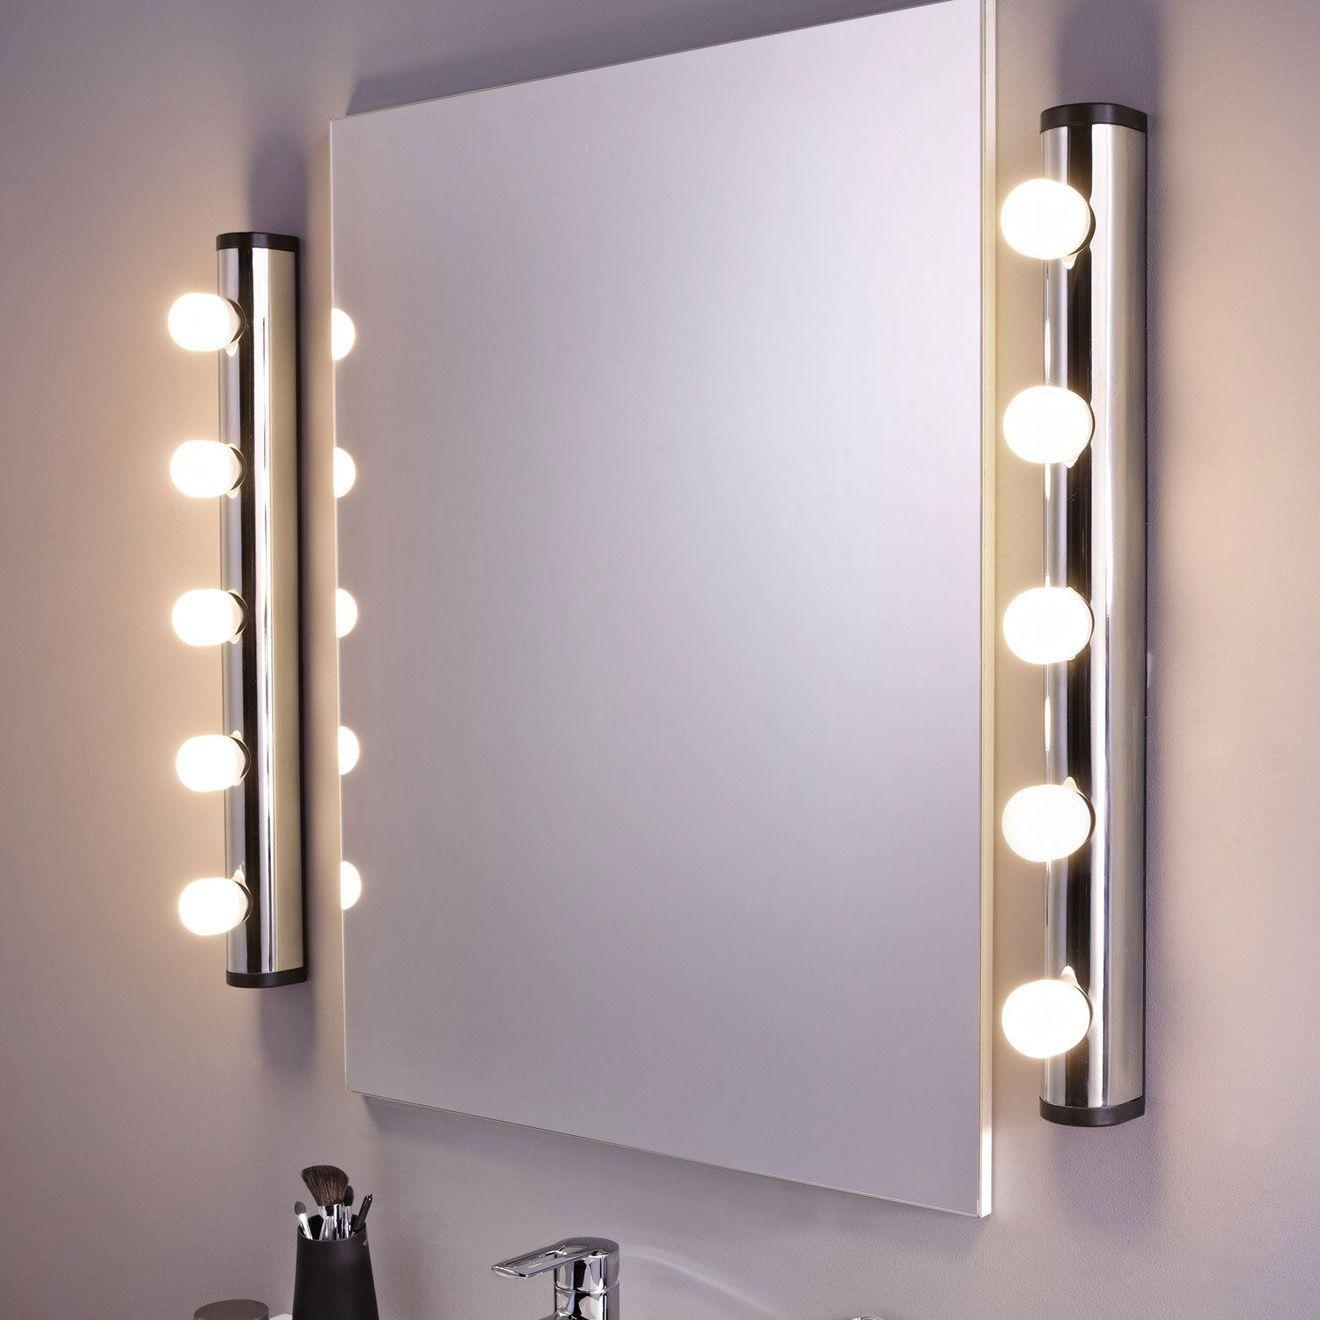 New Miroir Salle De Bain Leroy Merlin Led